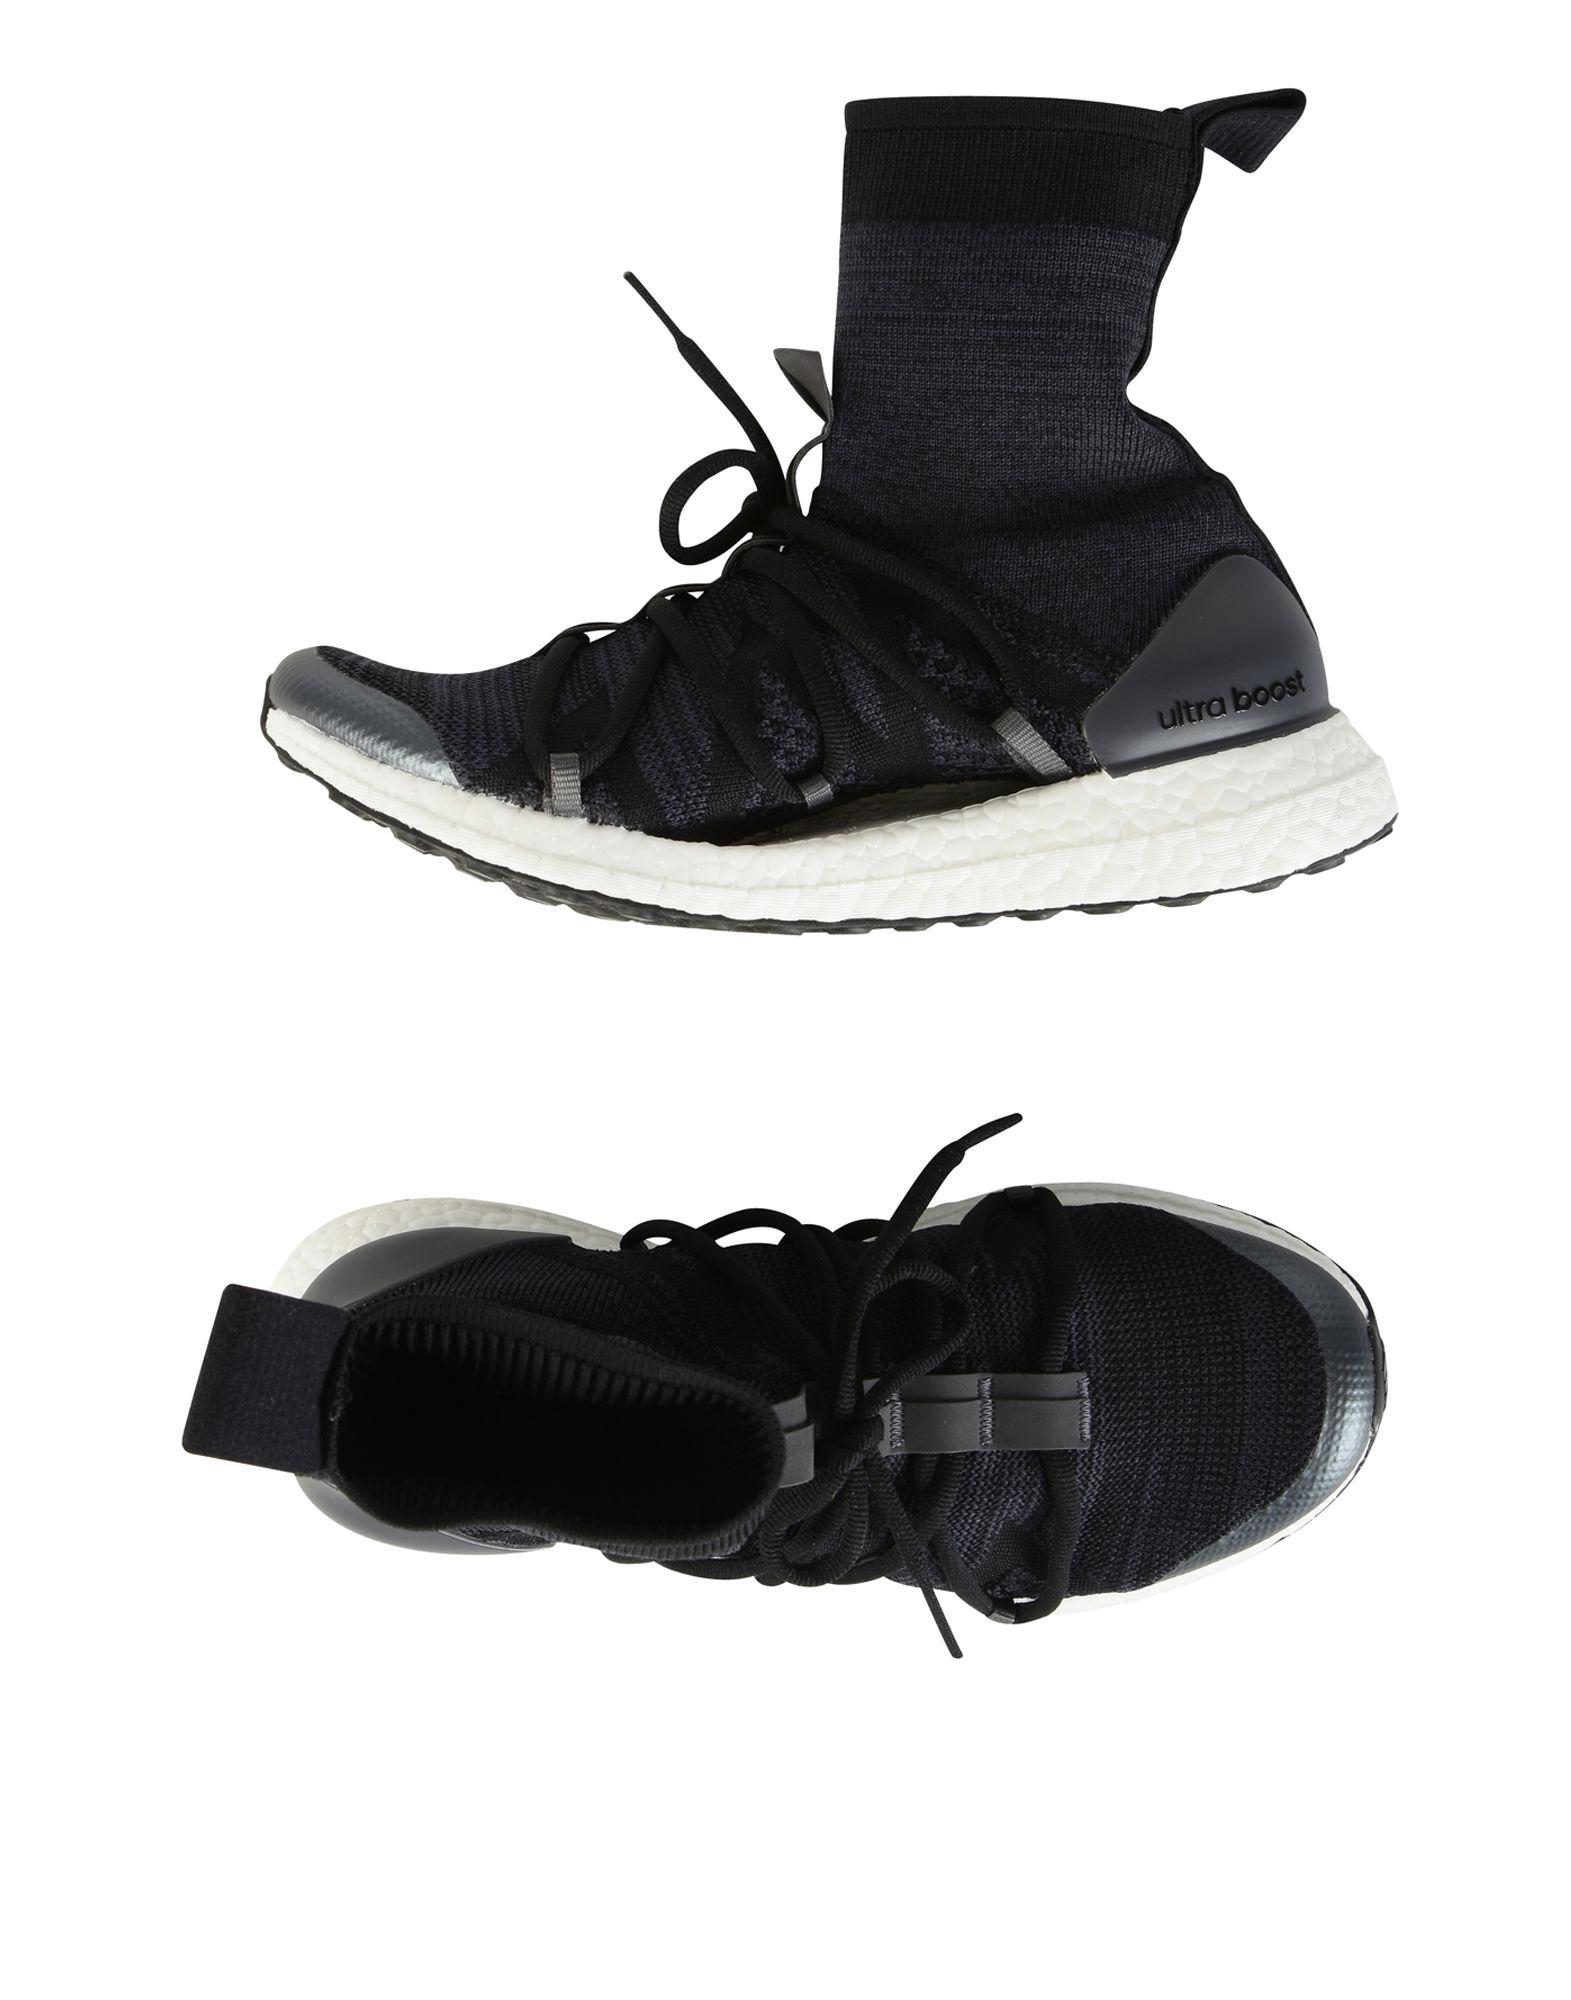 79cac5b2a087 Adidas By Stella Mccartney Ultraboost X Mid - Sneakers - Women ...